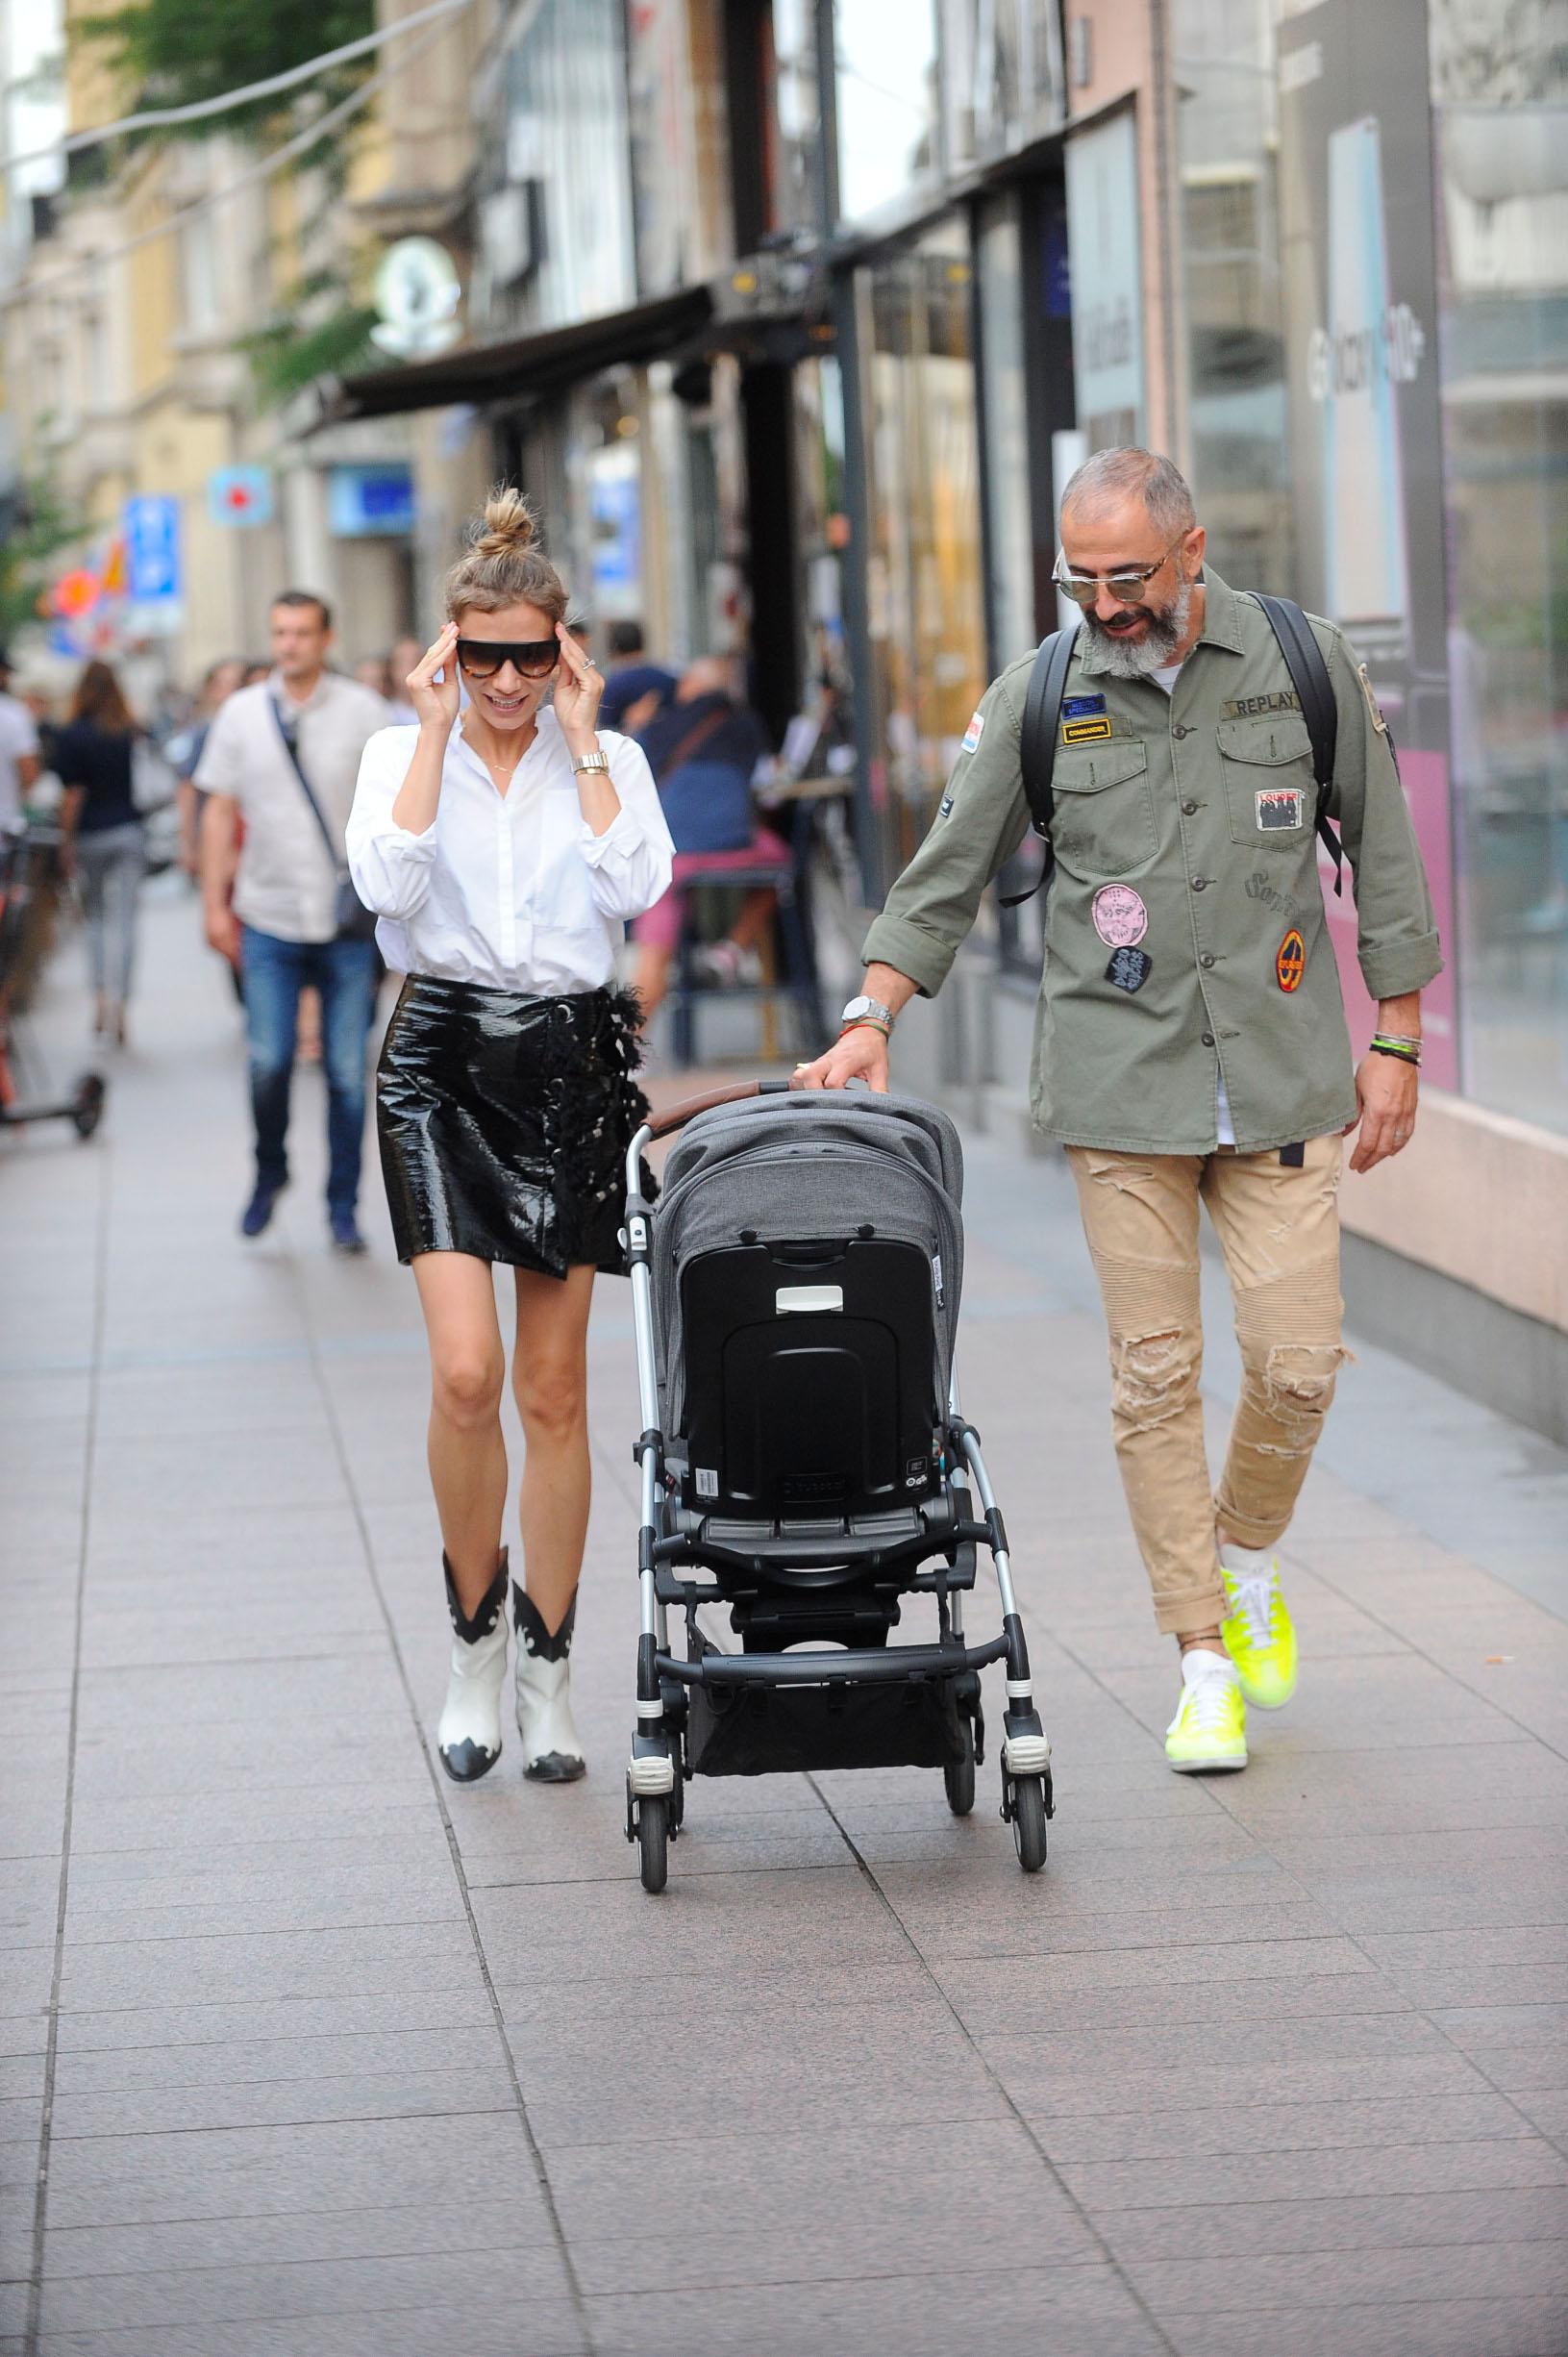 Spica / Zagreb 11.07.2019. / foto: Davor Matota / Marina Matic i suprug Kreso Matic i sin Vid